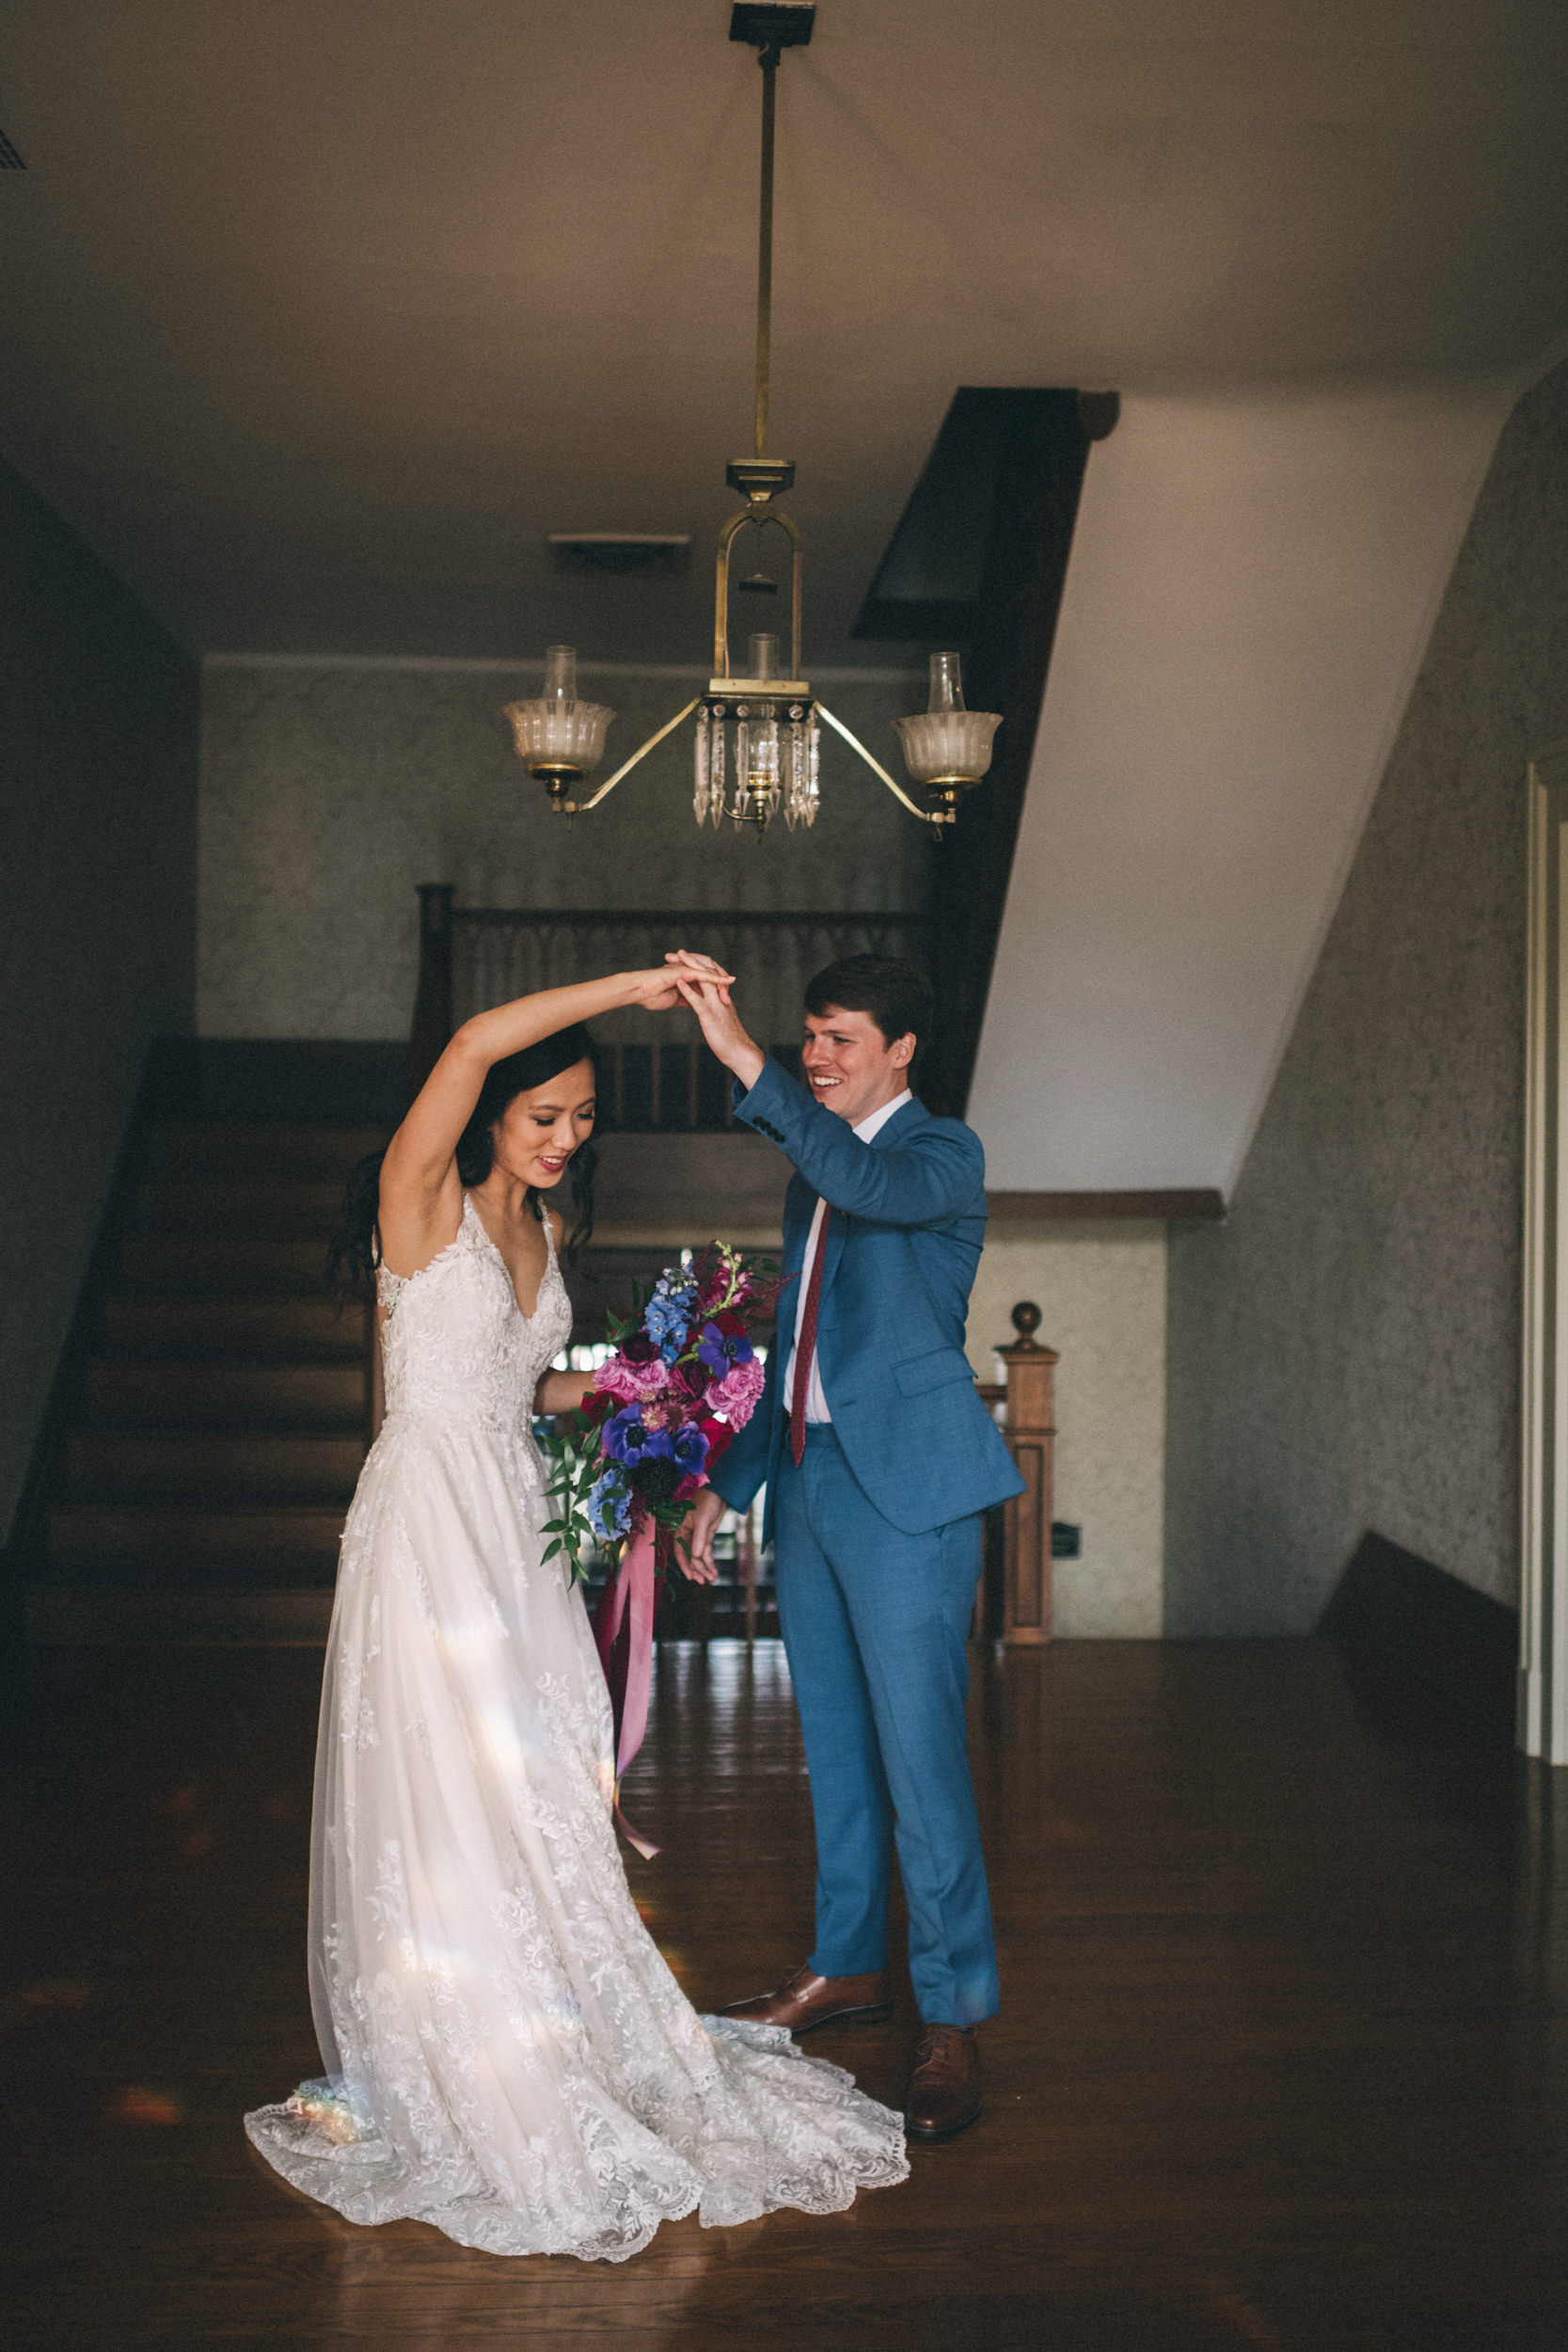 Louisville-Kentucky-Wedding-and-Elopement-Photographer-Sarah-Katherine-Davis-Photography-Summer-Jewel-Toned-Wedding-Chineese-Tea-Ceremony-Warrenwood-Manor-Danville-427.jpg